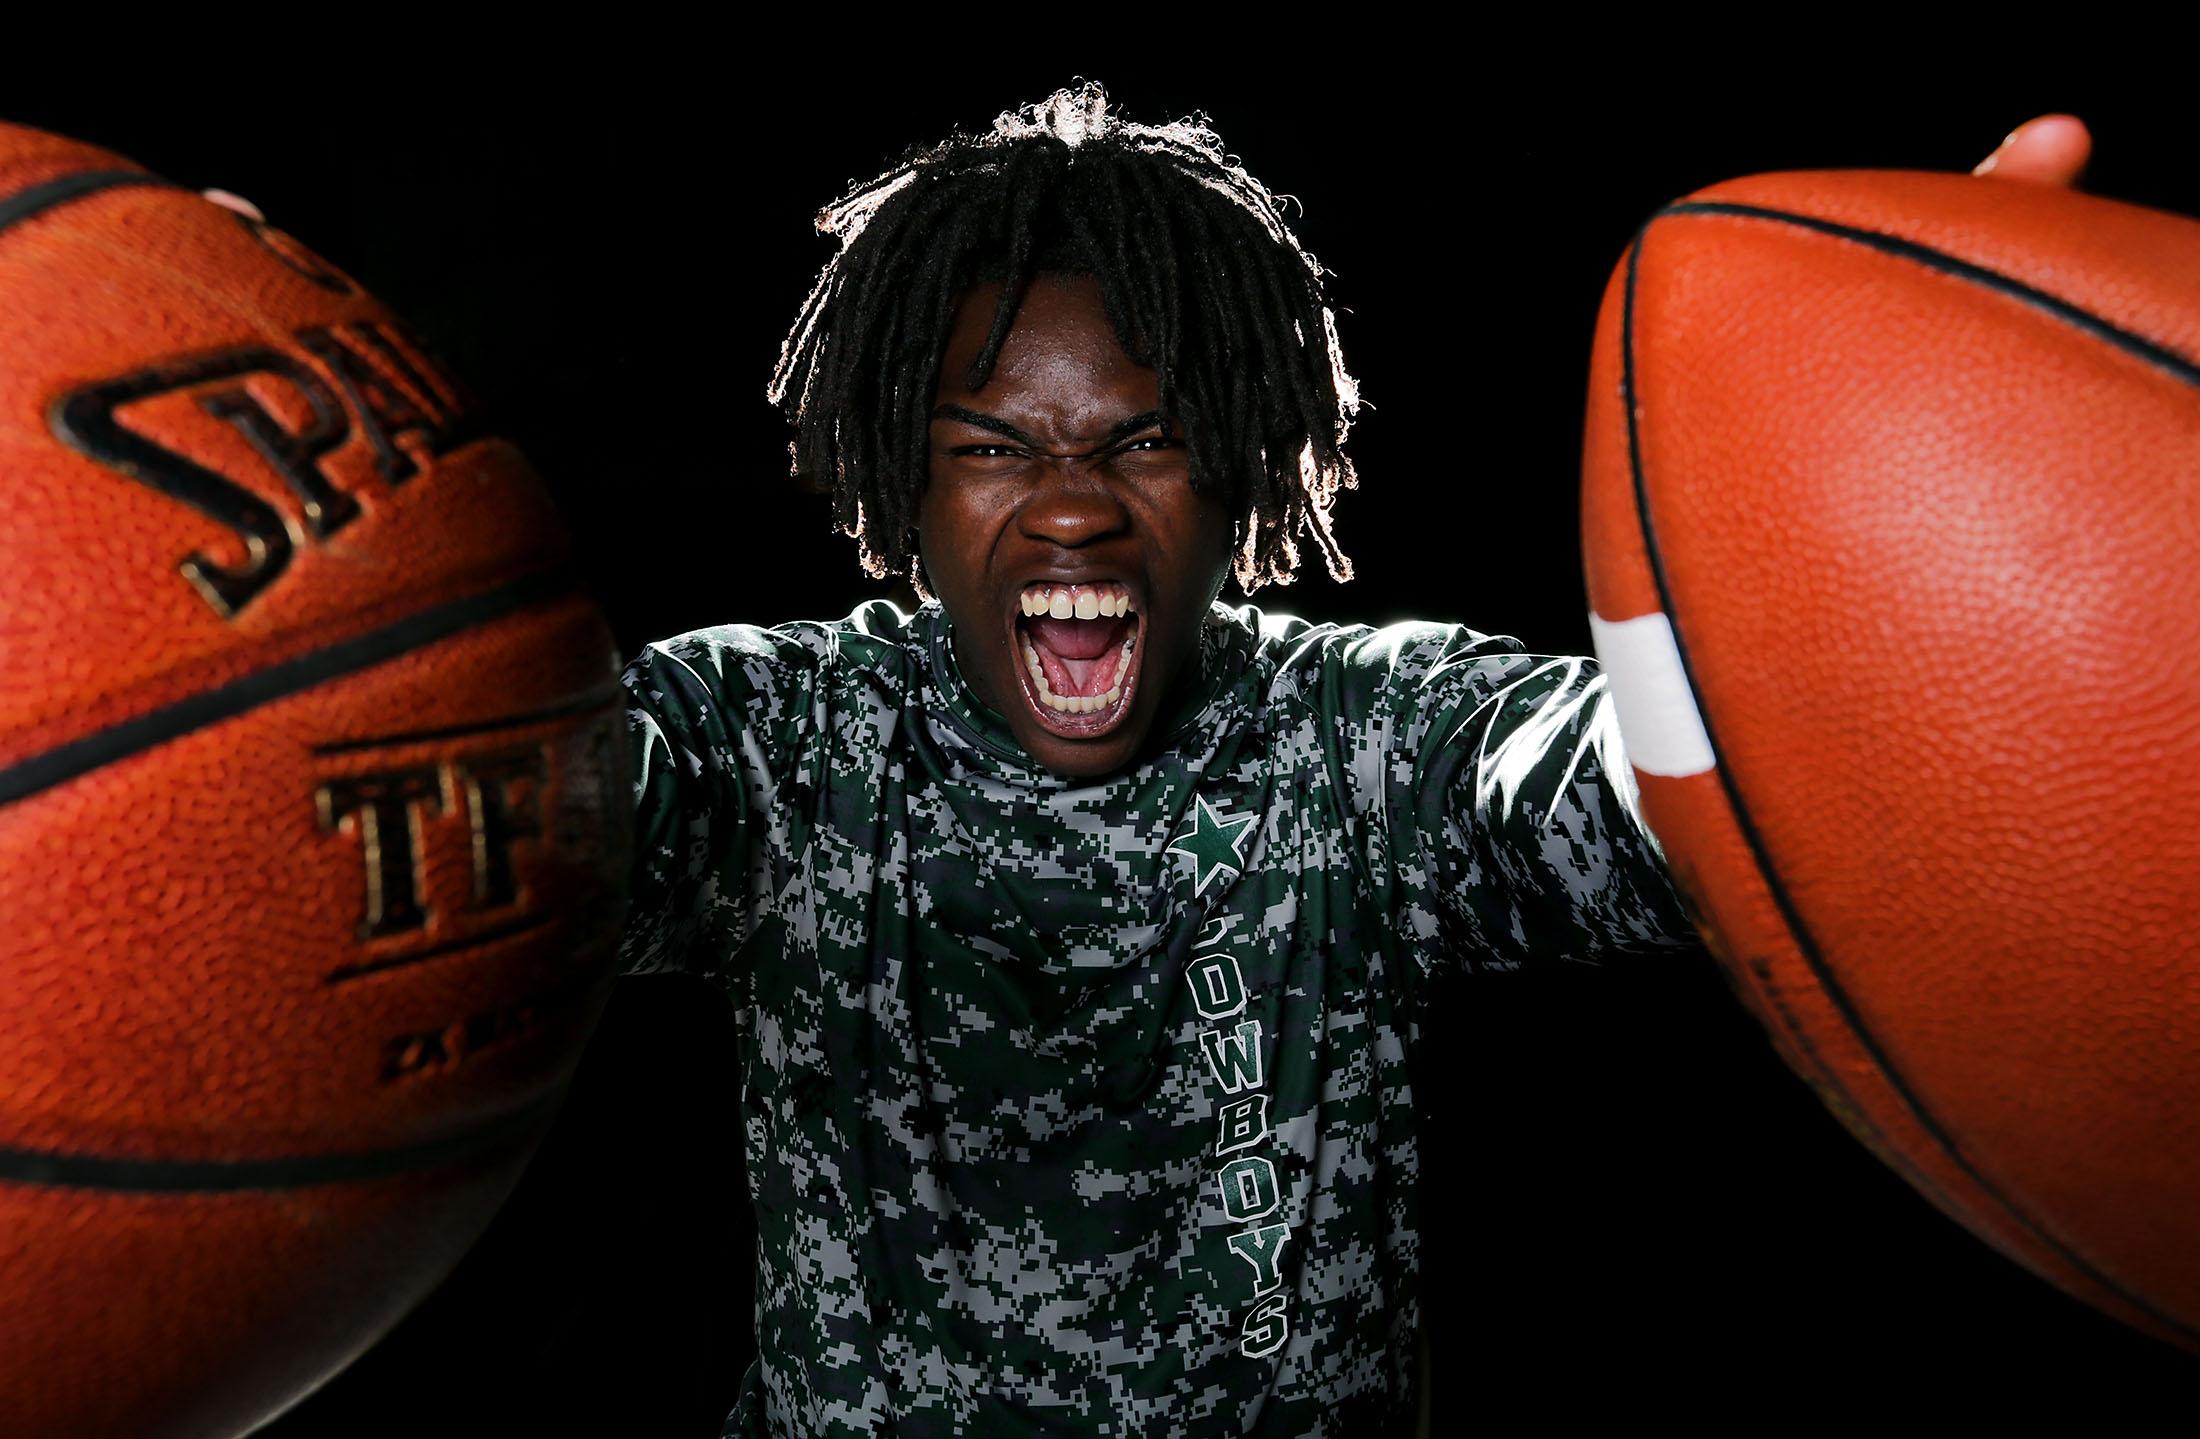 Cajon football and basketball star Jeremiah Martin has been chosen the HSGameTime large schools boys athlete of the yea Monday in San Bernardino, Calif. May 21, 2018.